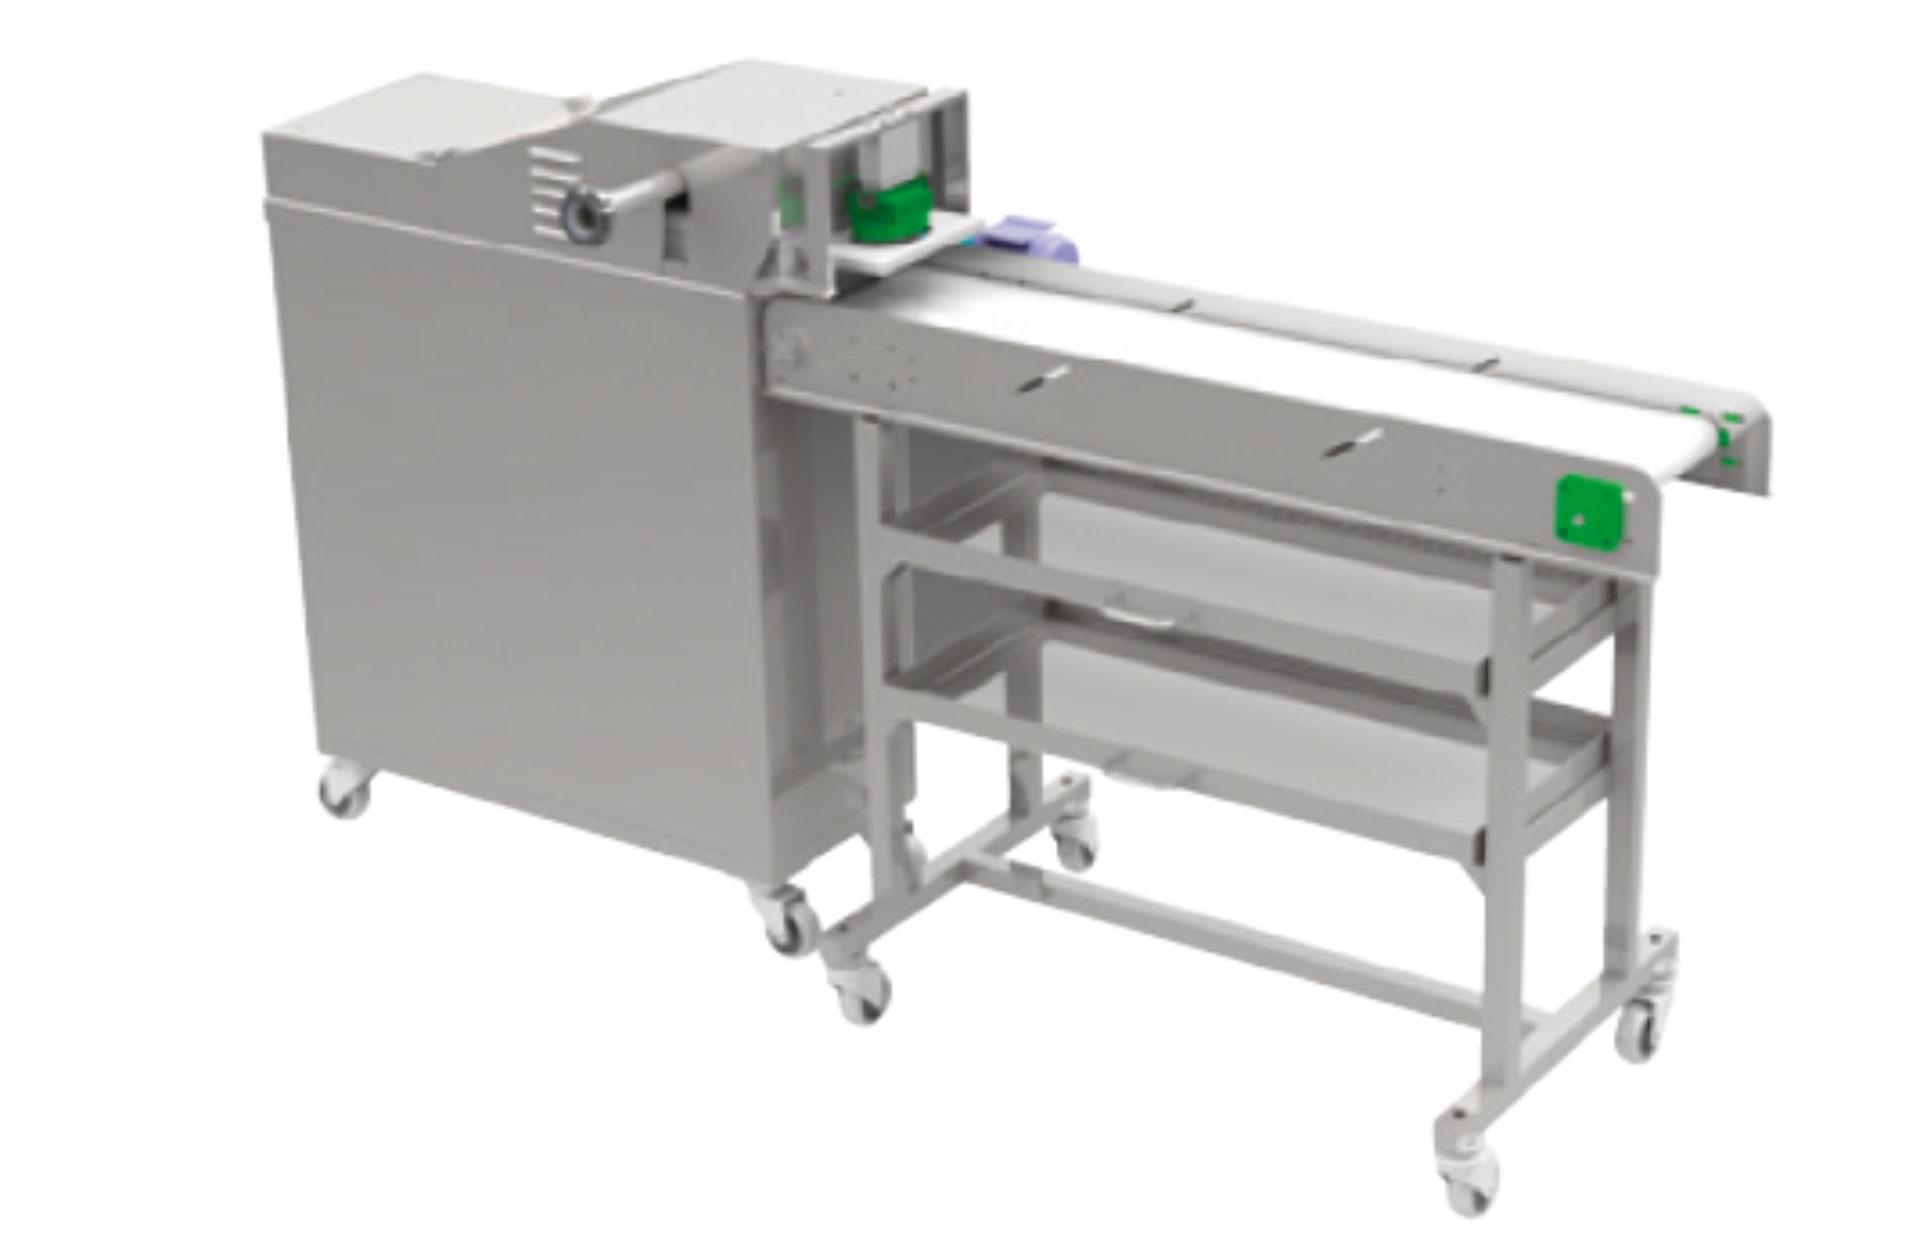 MFM-3000 MFM-Series Meatball Forming Machine